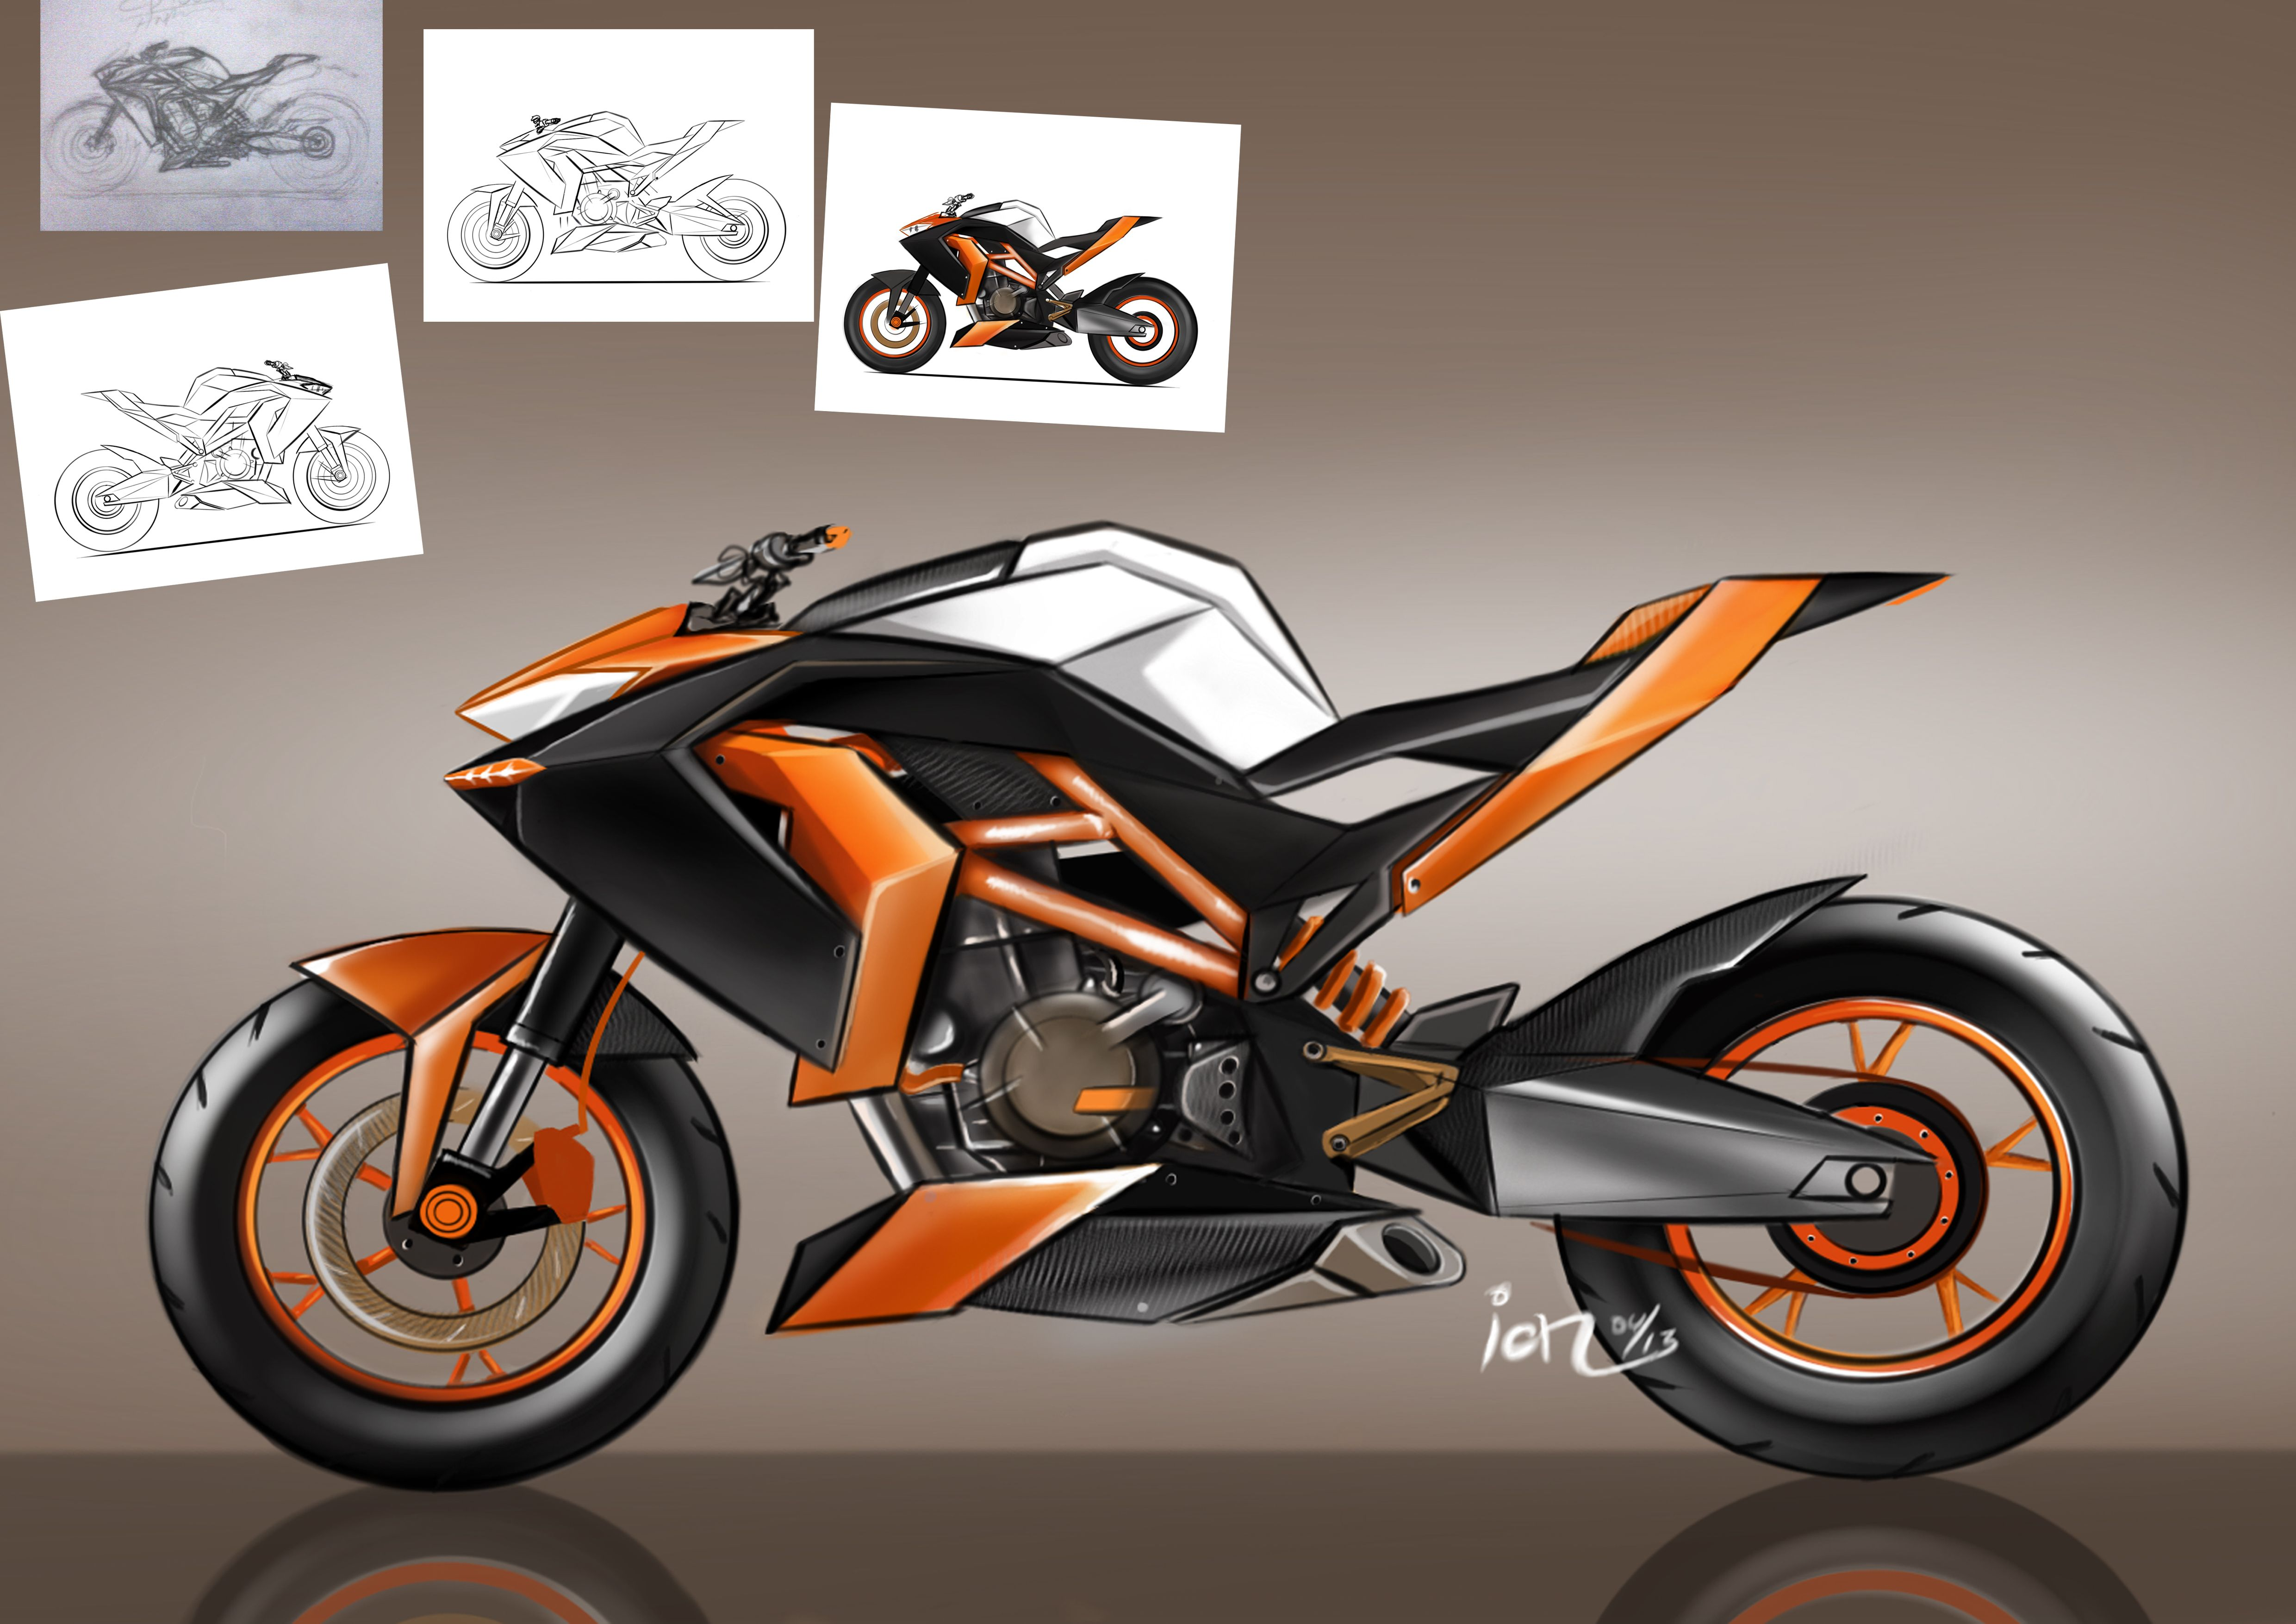 Ktm Duke Concept Draw Concept Motorcycles Bike Design